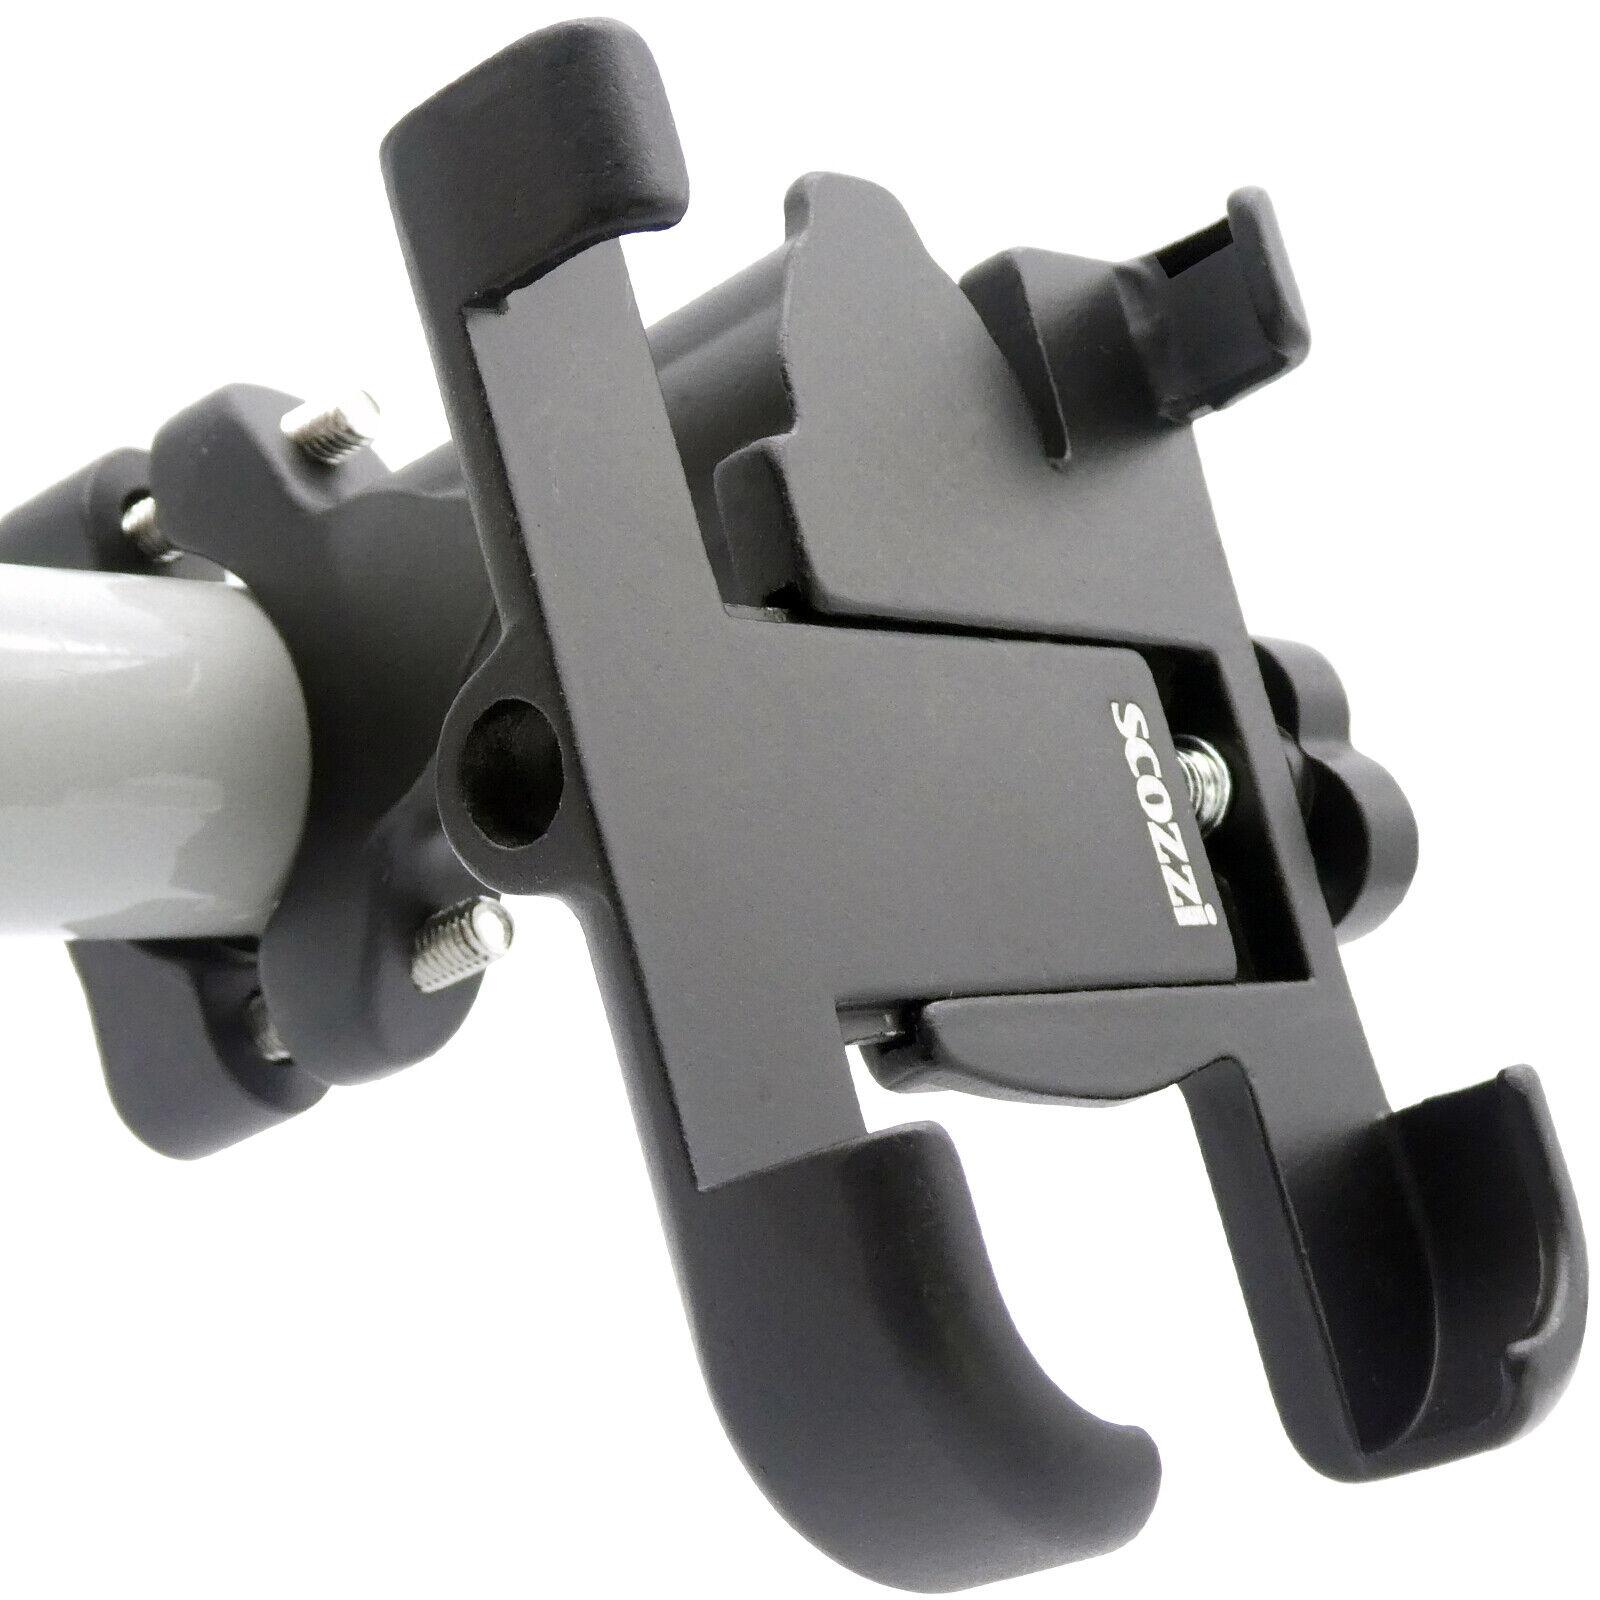 scozzi®Handyhalterung Fahrrad Lenker Universal Handy Smartphone Halter Halterung